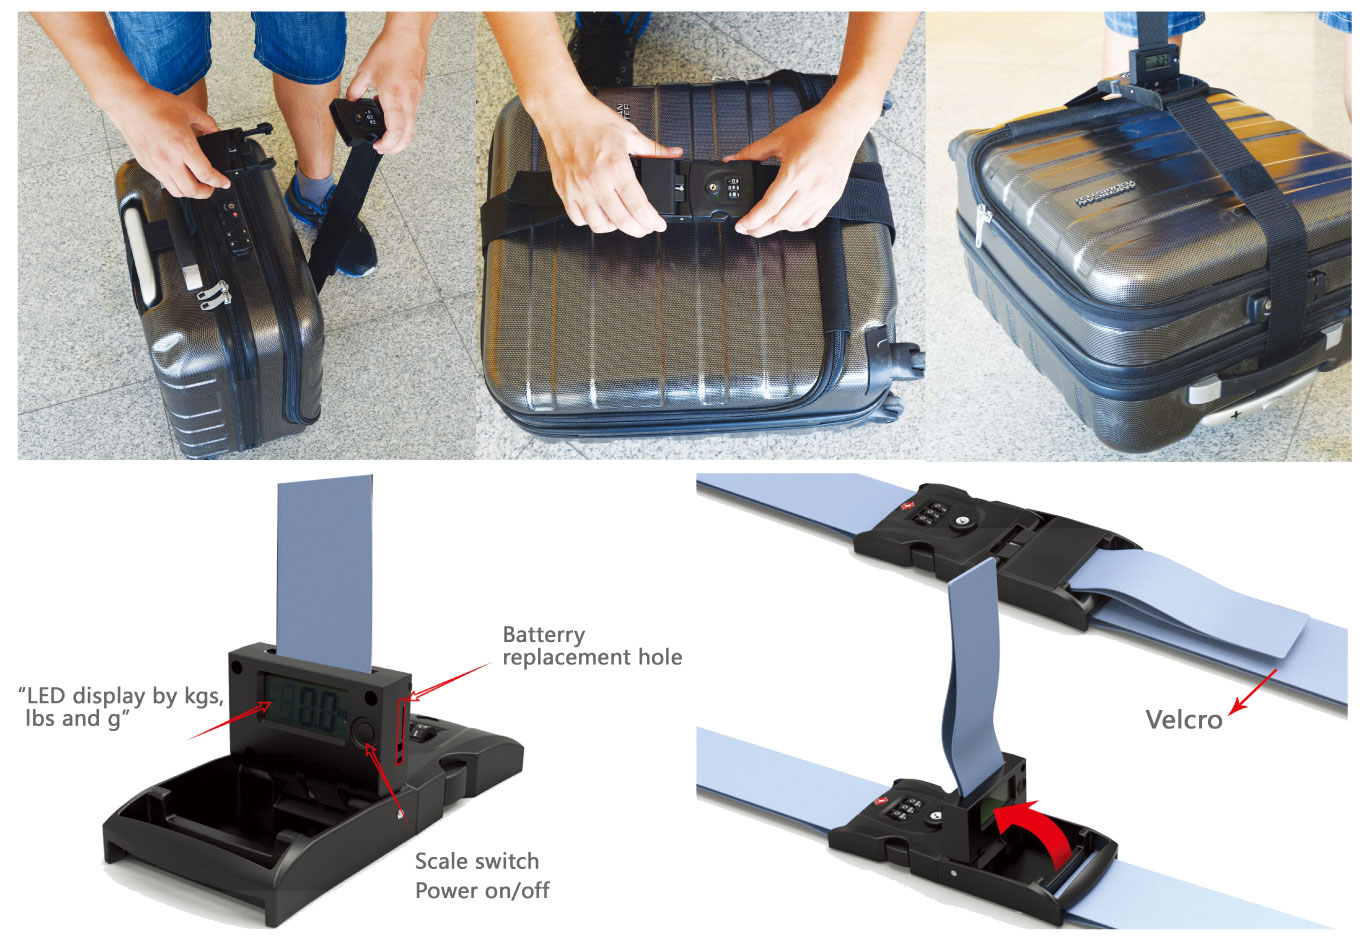 proimages/products/04-Traveling_Luggage/04-Strap_Locks/SL0973/SL0973-4.jpg